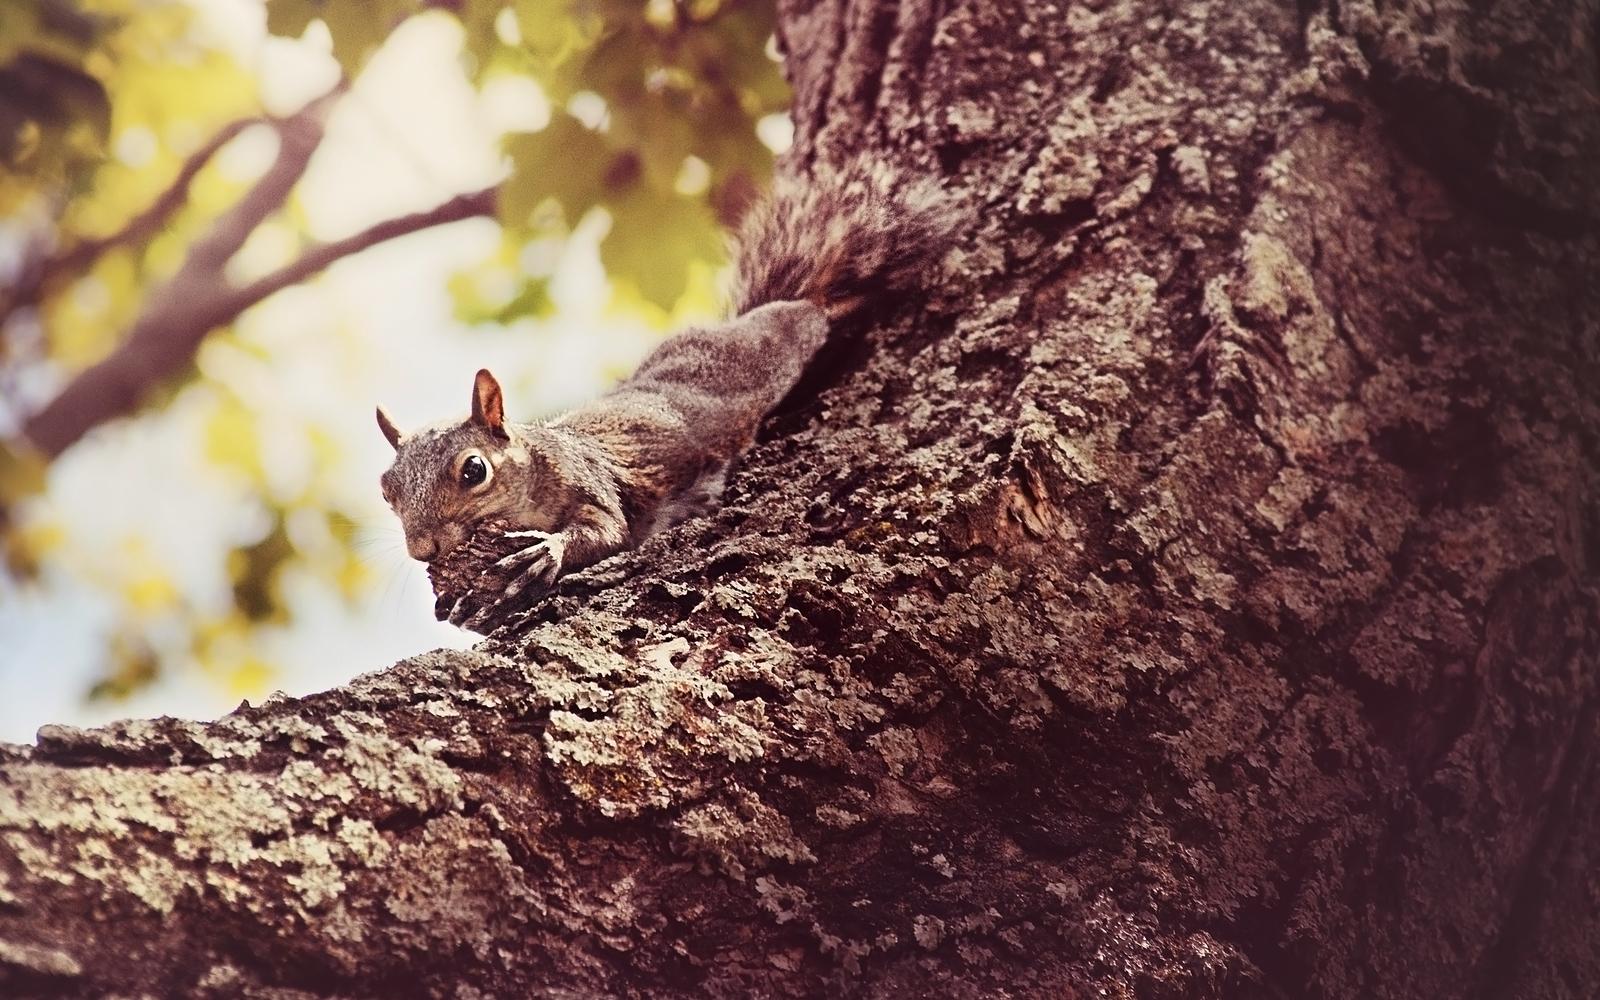 My Nut by bluesabreWife